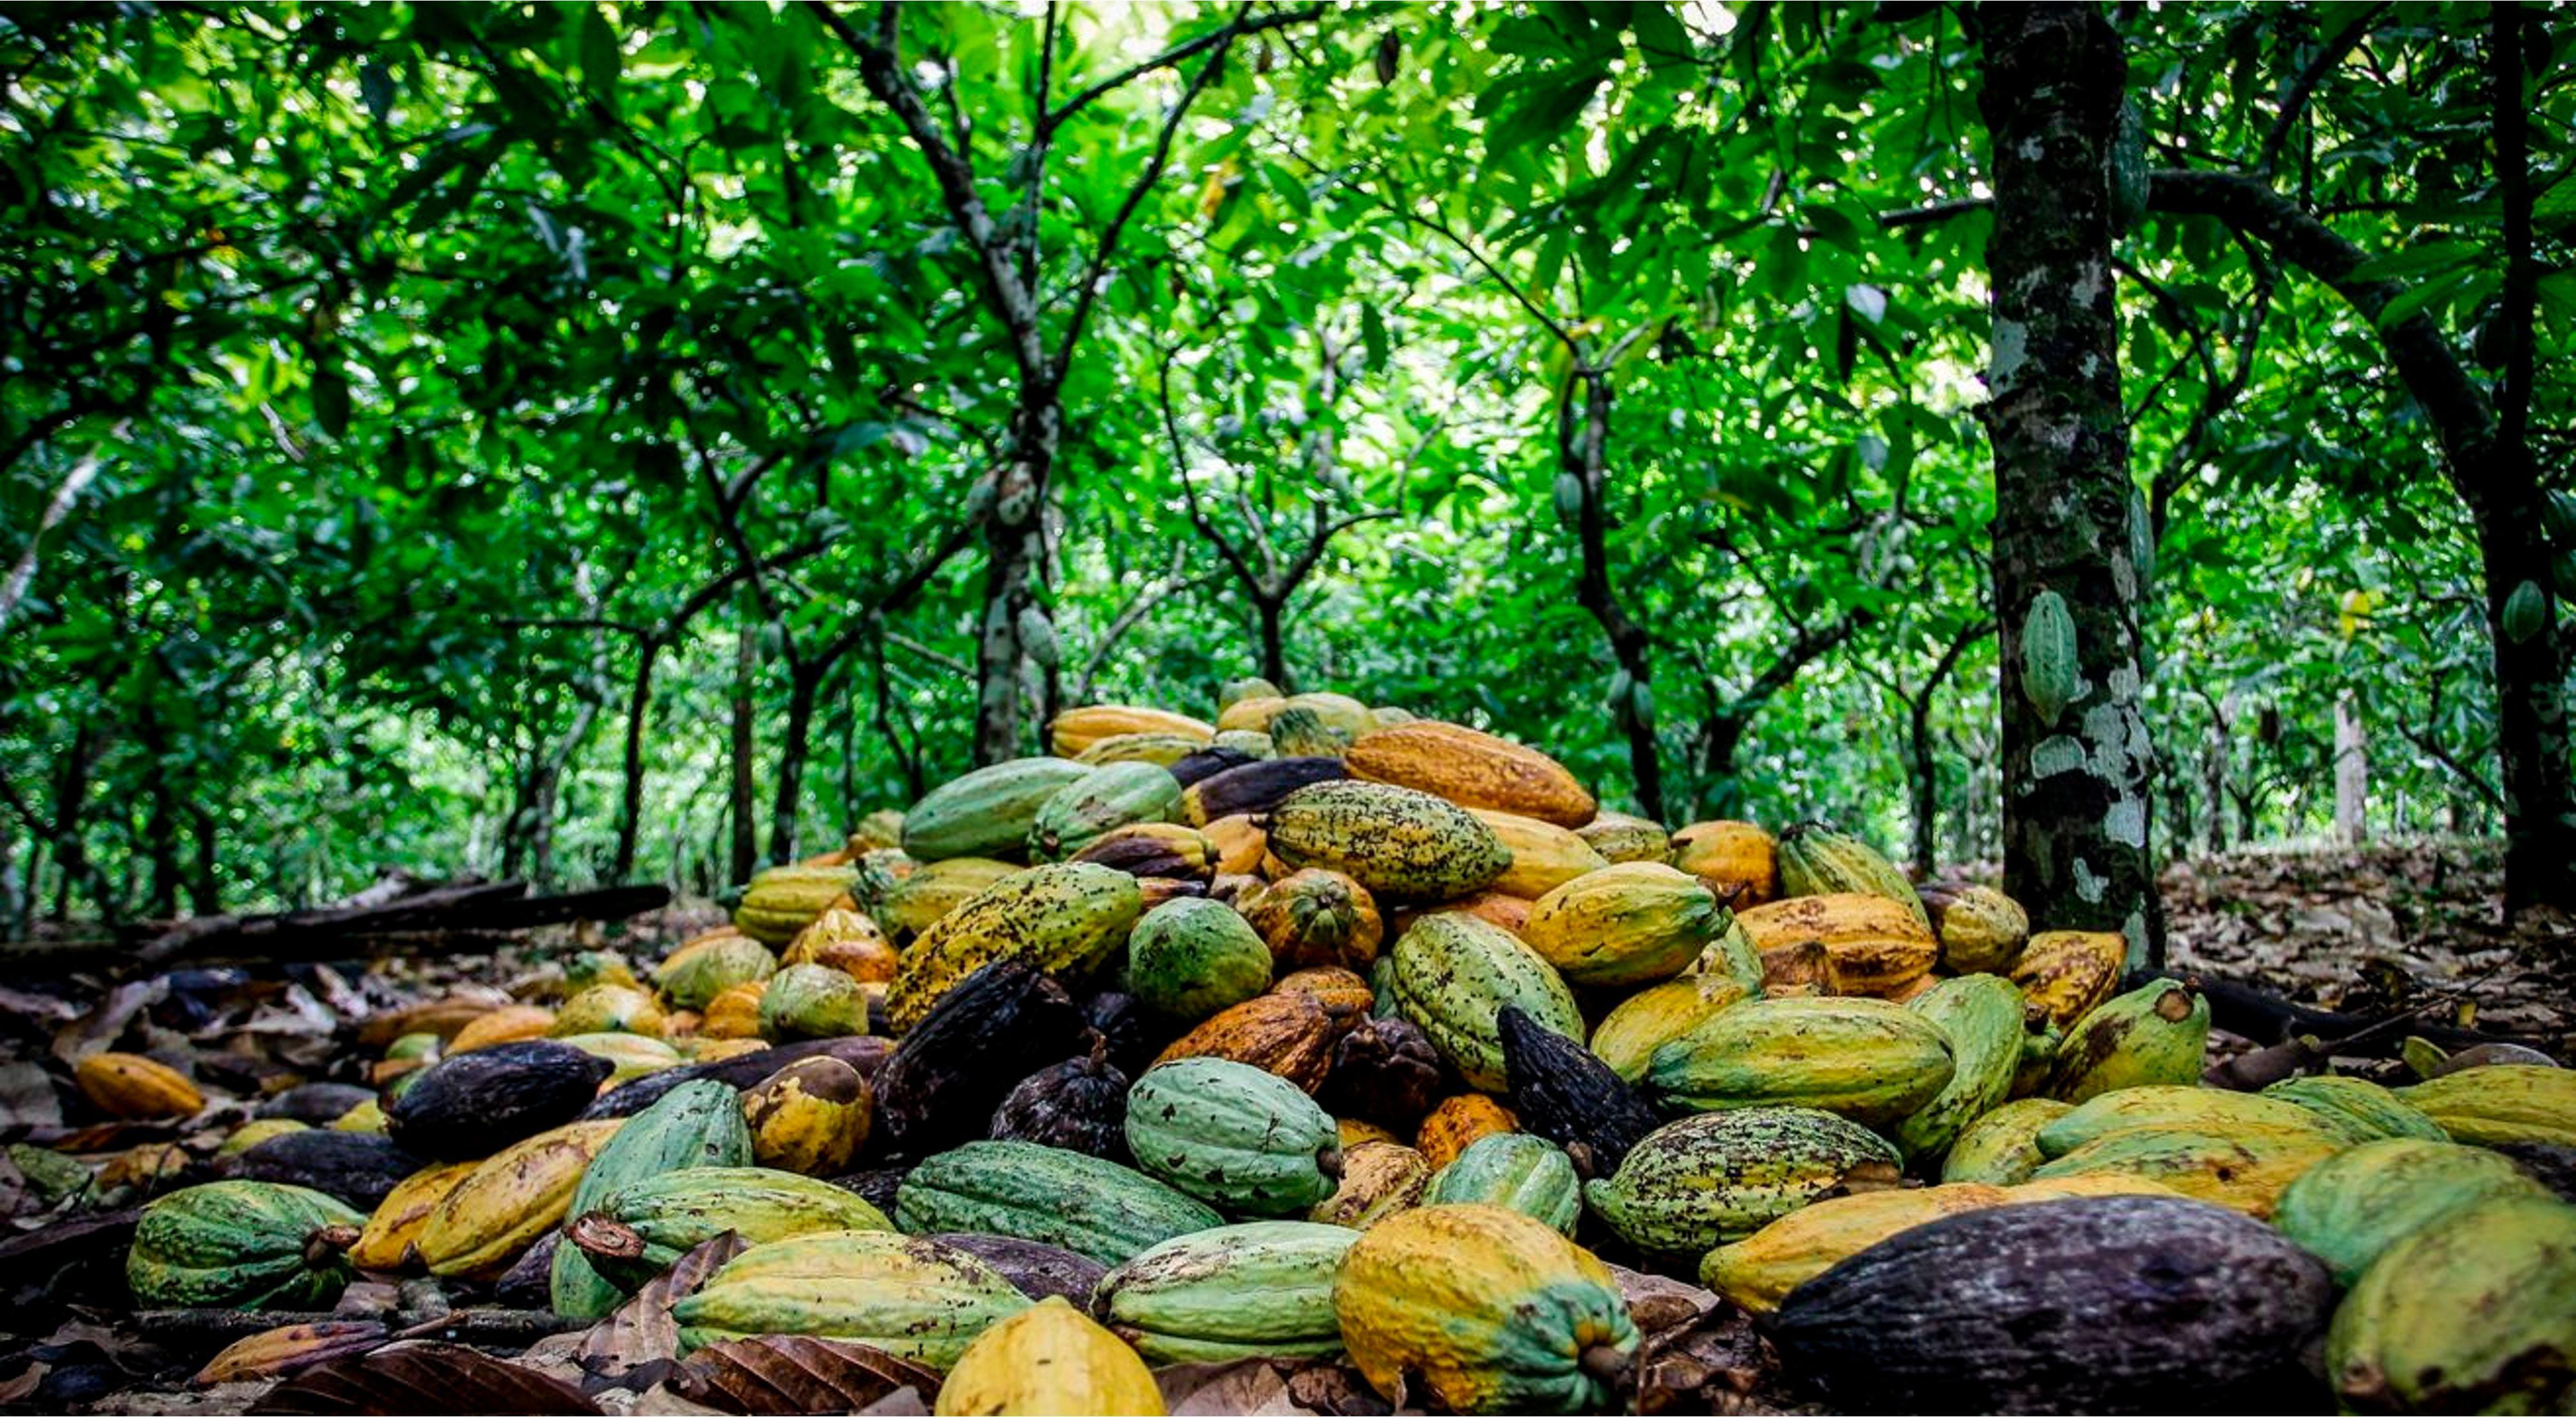 Mature cacao pods in Sao Félix do Xingu, Brazilian Amazon